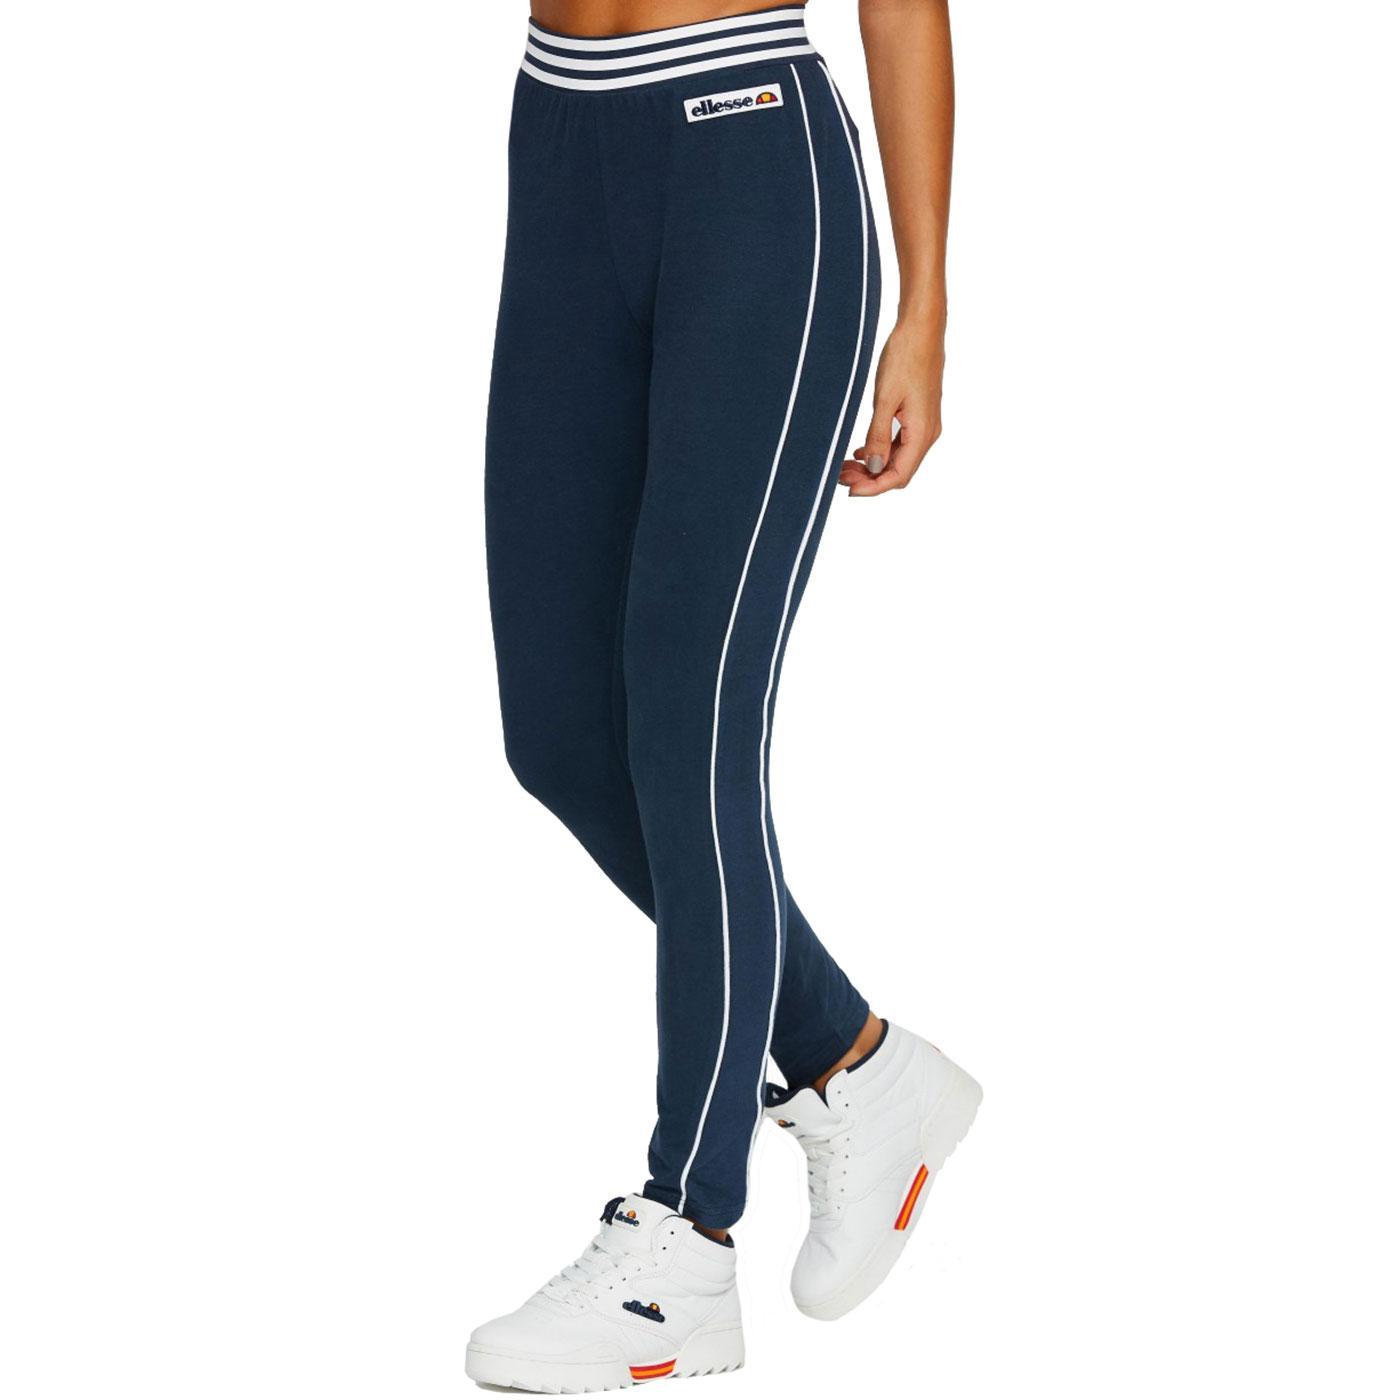 Adona ELLESSE Women's Skinny Piped Track Pants